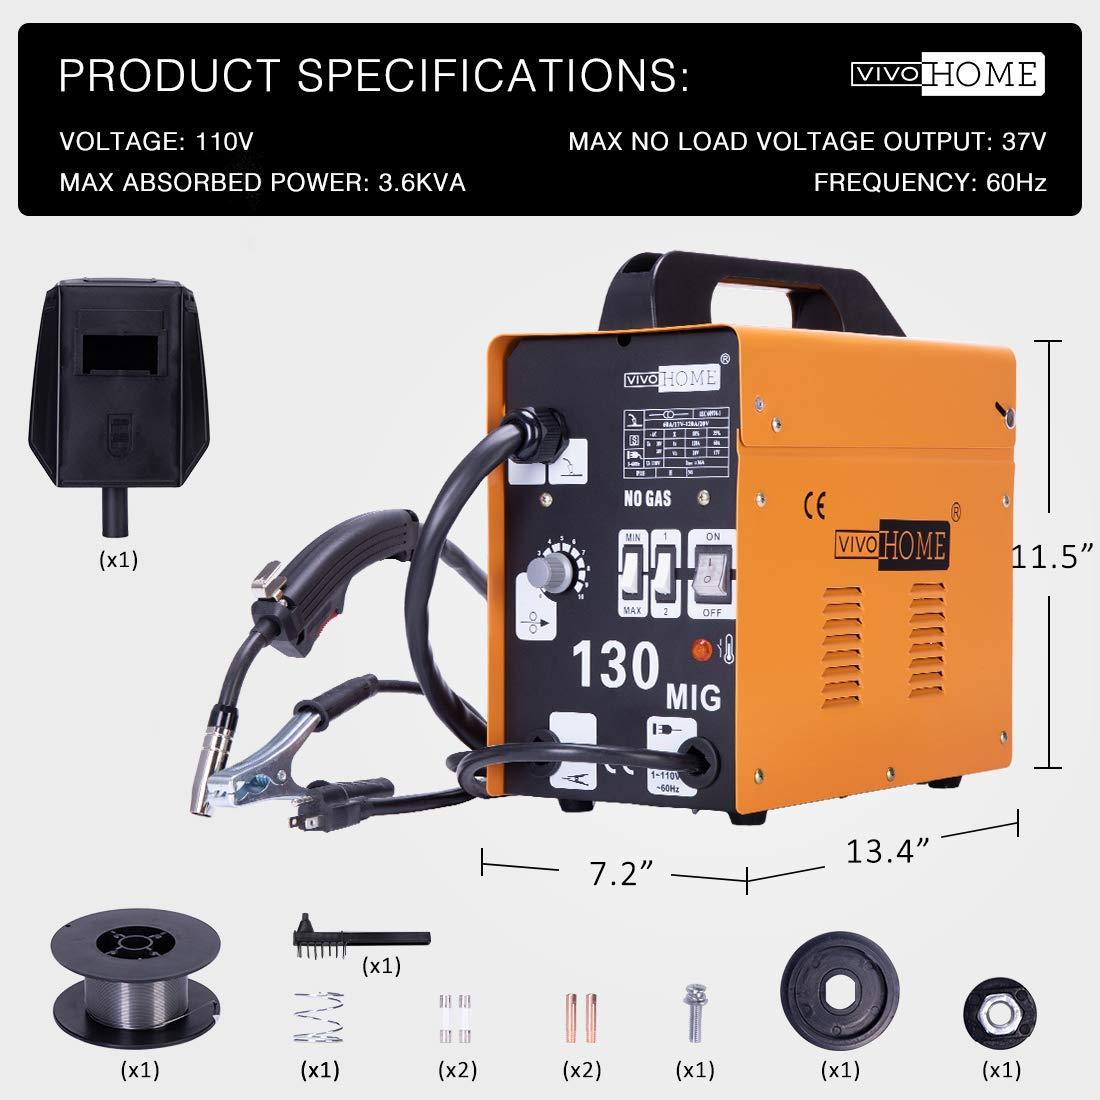 VIVOHOME Portable Flux Core Wire No Gas MIG 130 Welder Machine 110V by VIVOHOME (Image #6)